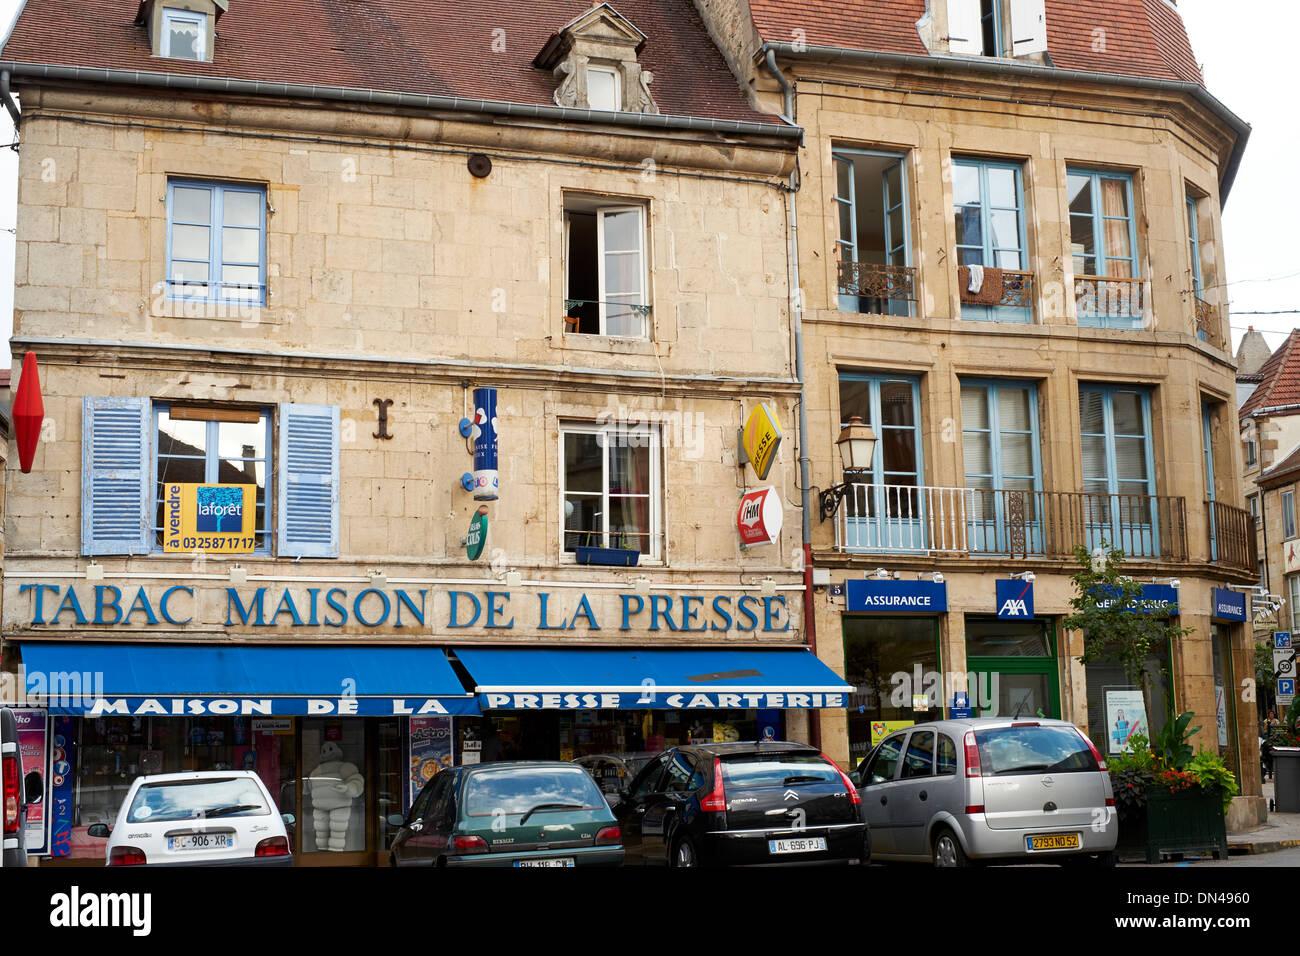 Tabac presse photos tabac presse images alamy